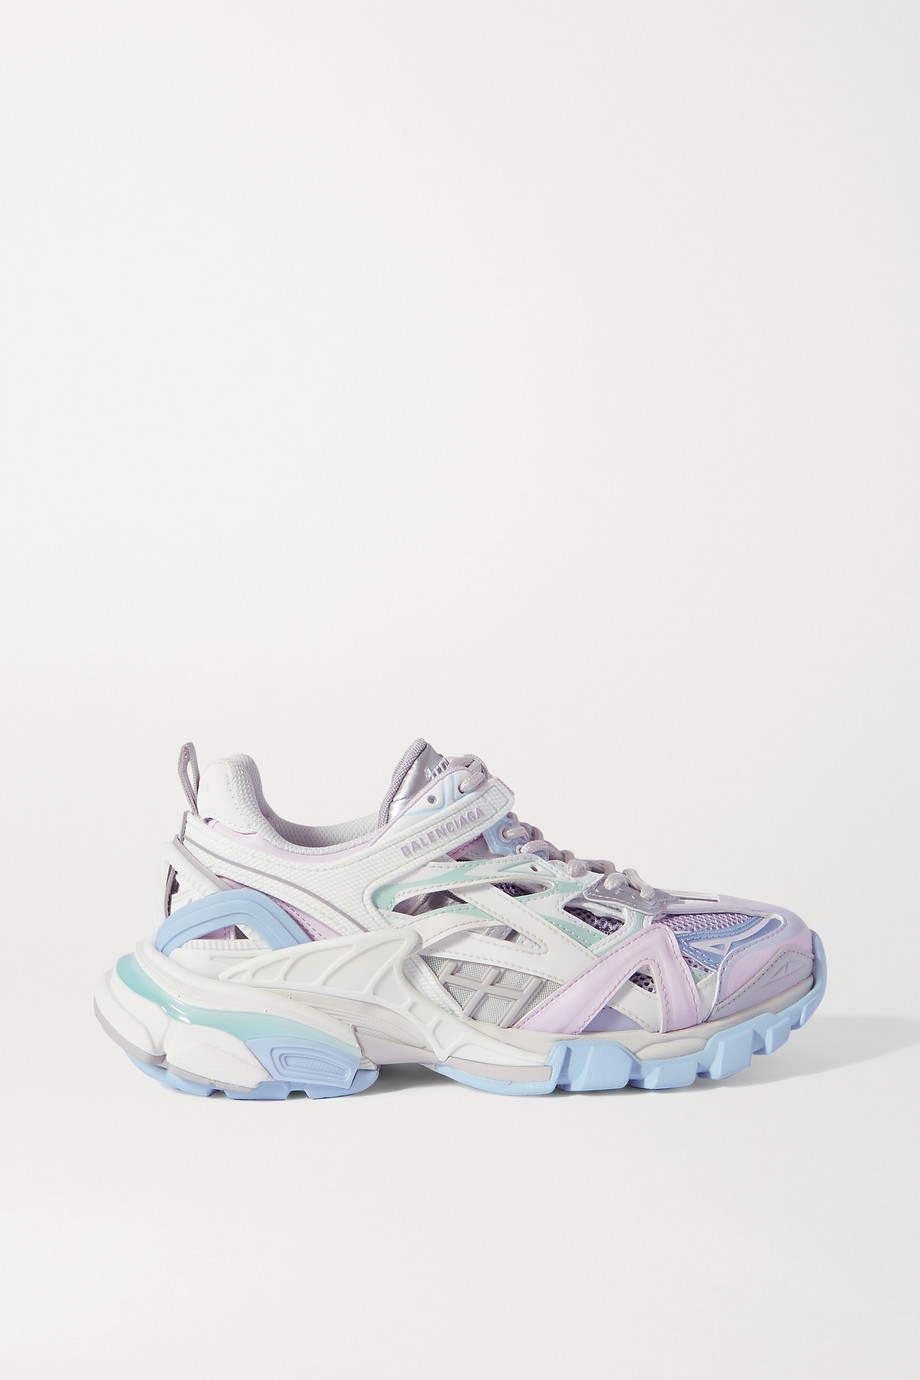 Balenciaga Track 2 品牌标志细节金属感皮革网眼橡胶运动鞋